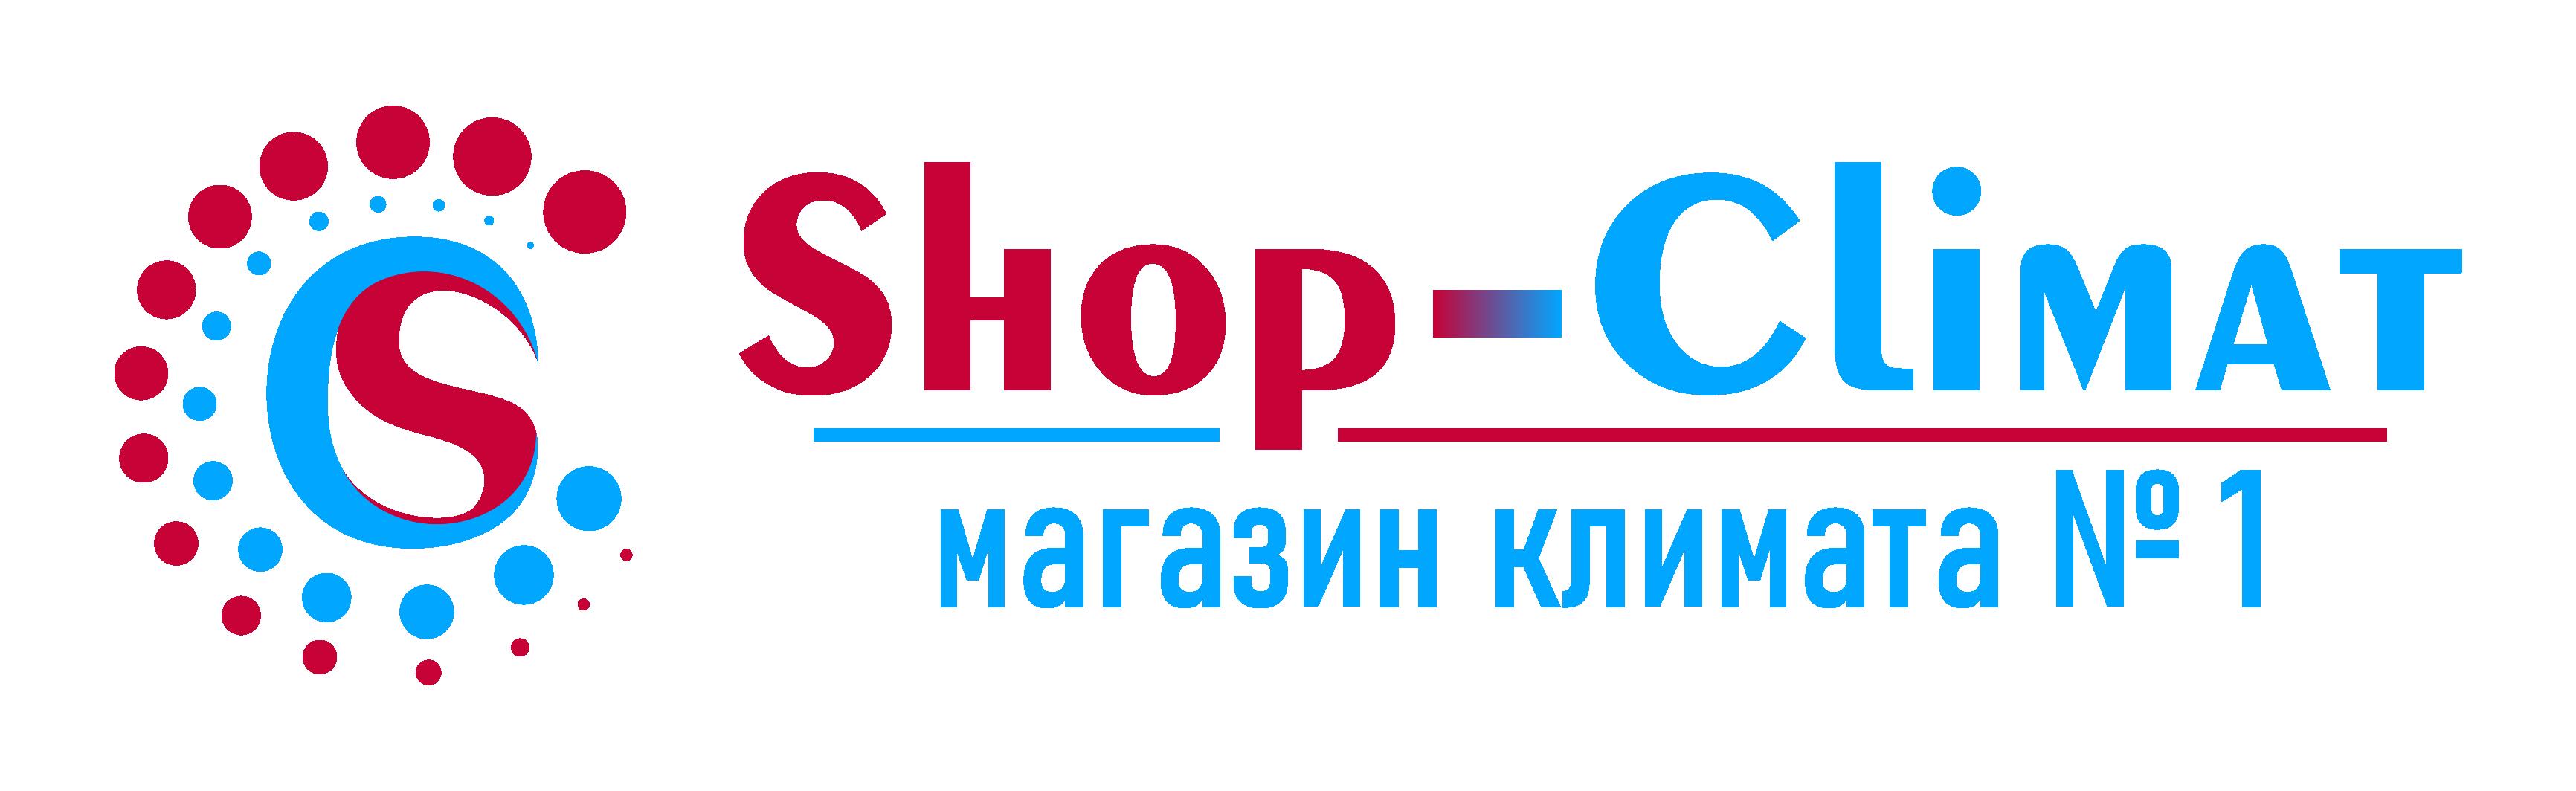 Shop-Climat.ru - интернет магазин климатической техники